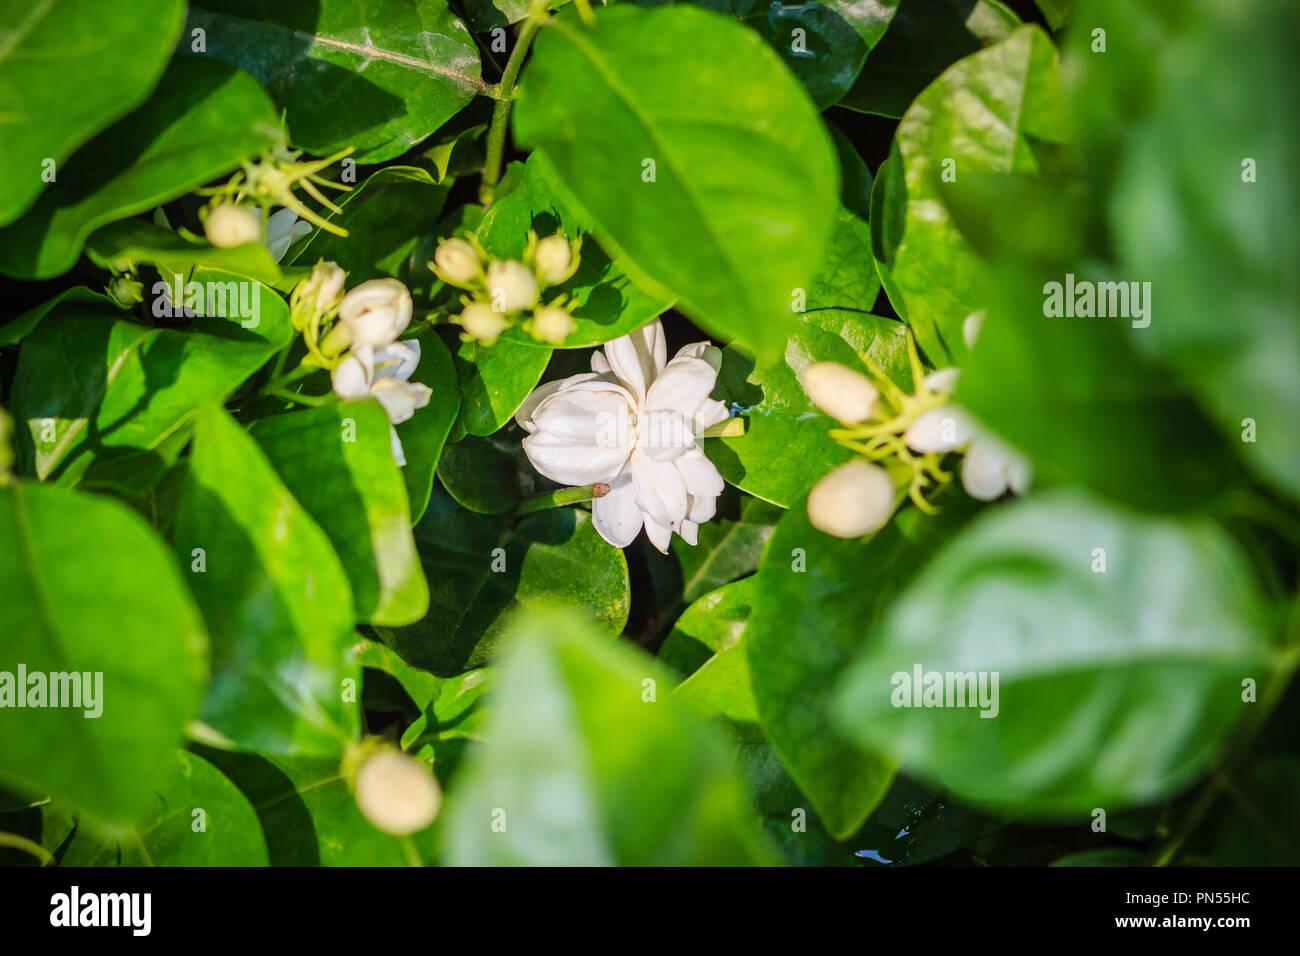 Cluster Of Budding Jasmine Flower In The Green Garden Background